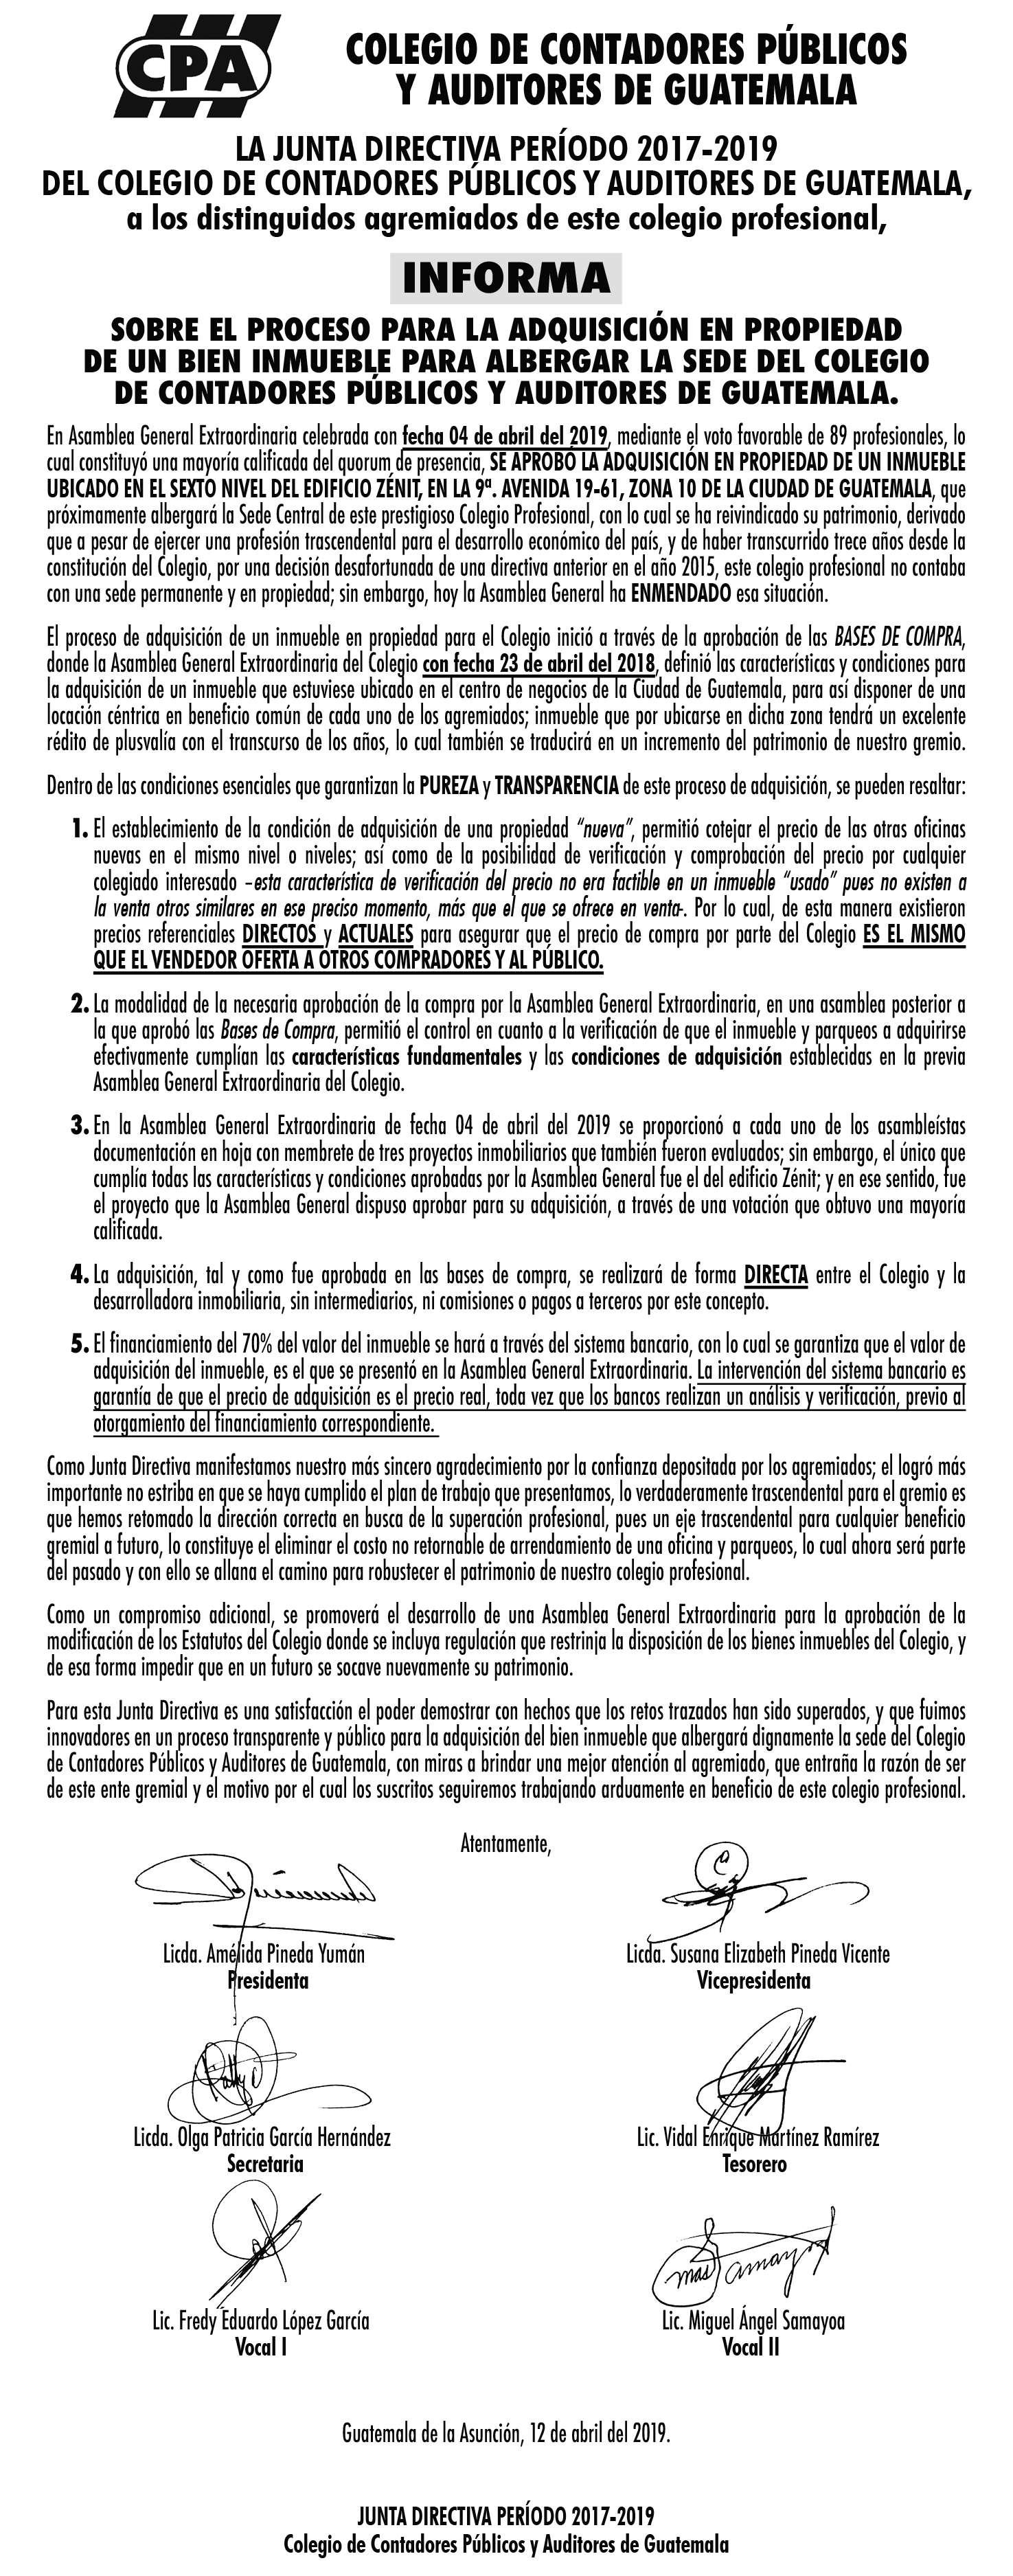 Junta Directiva 2017-2019 Informa